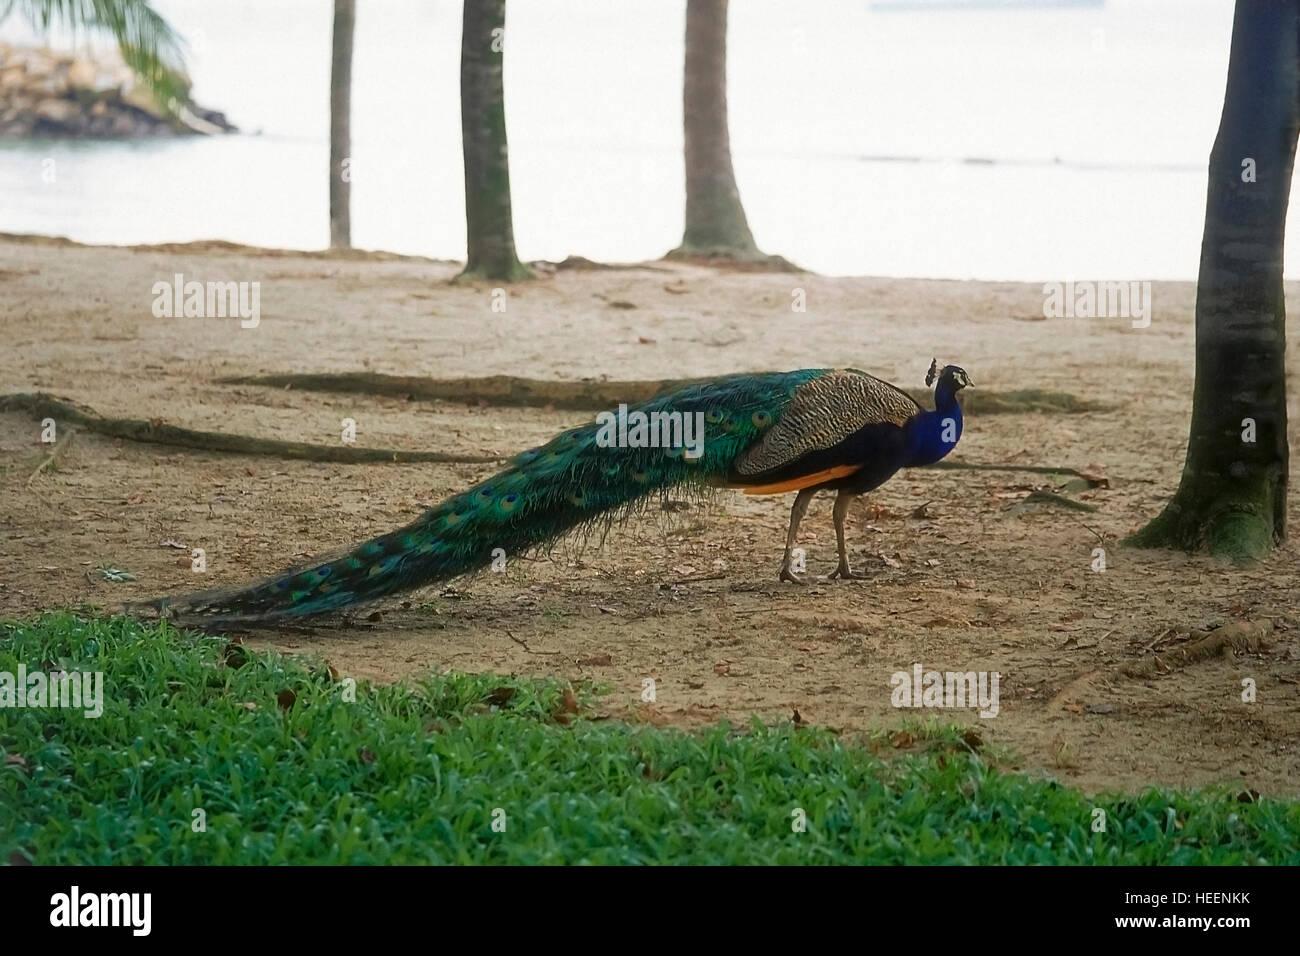 Peacock at Sentosa island, Singapore Stock Photo